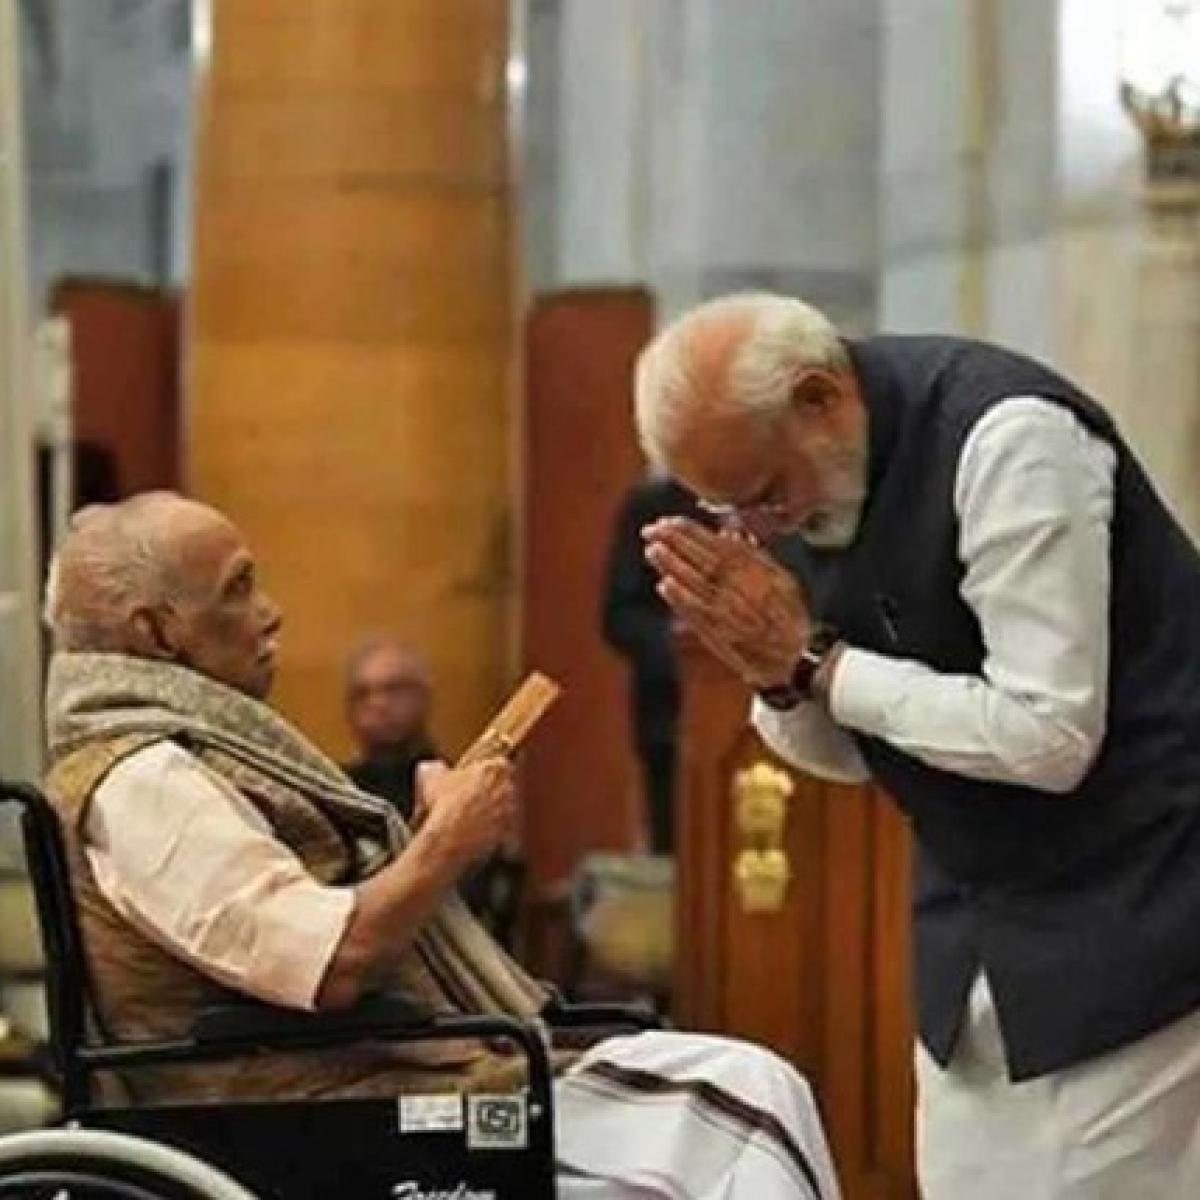 'Deeply saddened': Vice President Naidu, PM Modi condole death of RSS veteran Parameswaran